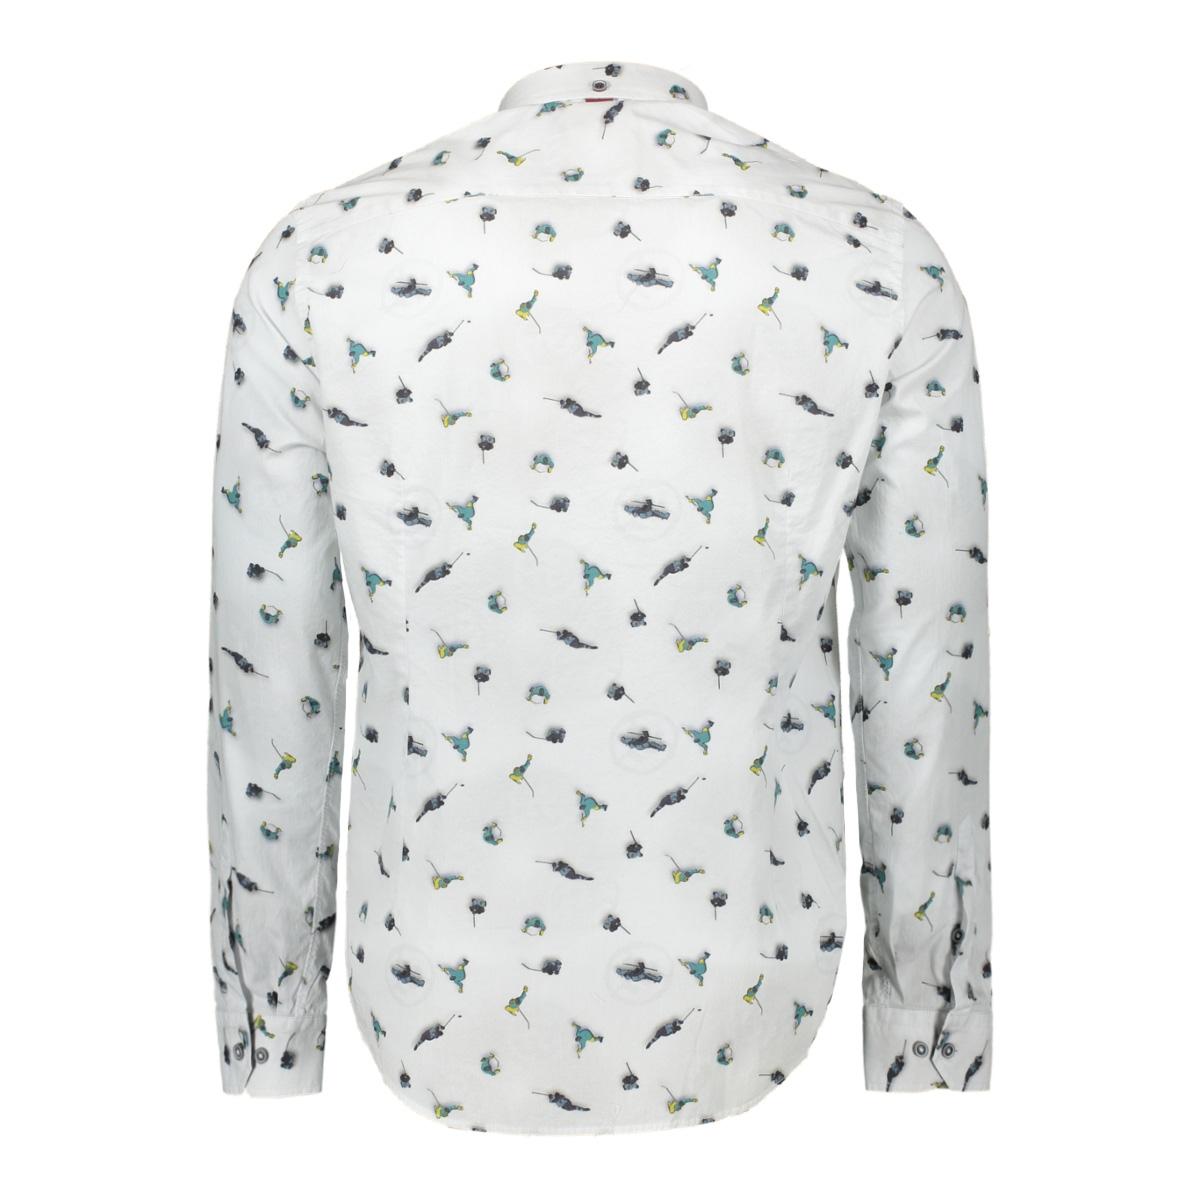 srt007 companeros overhemd 10white